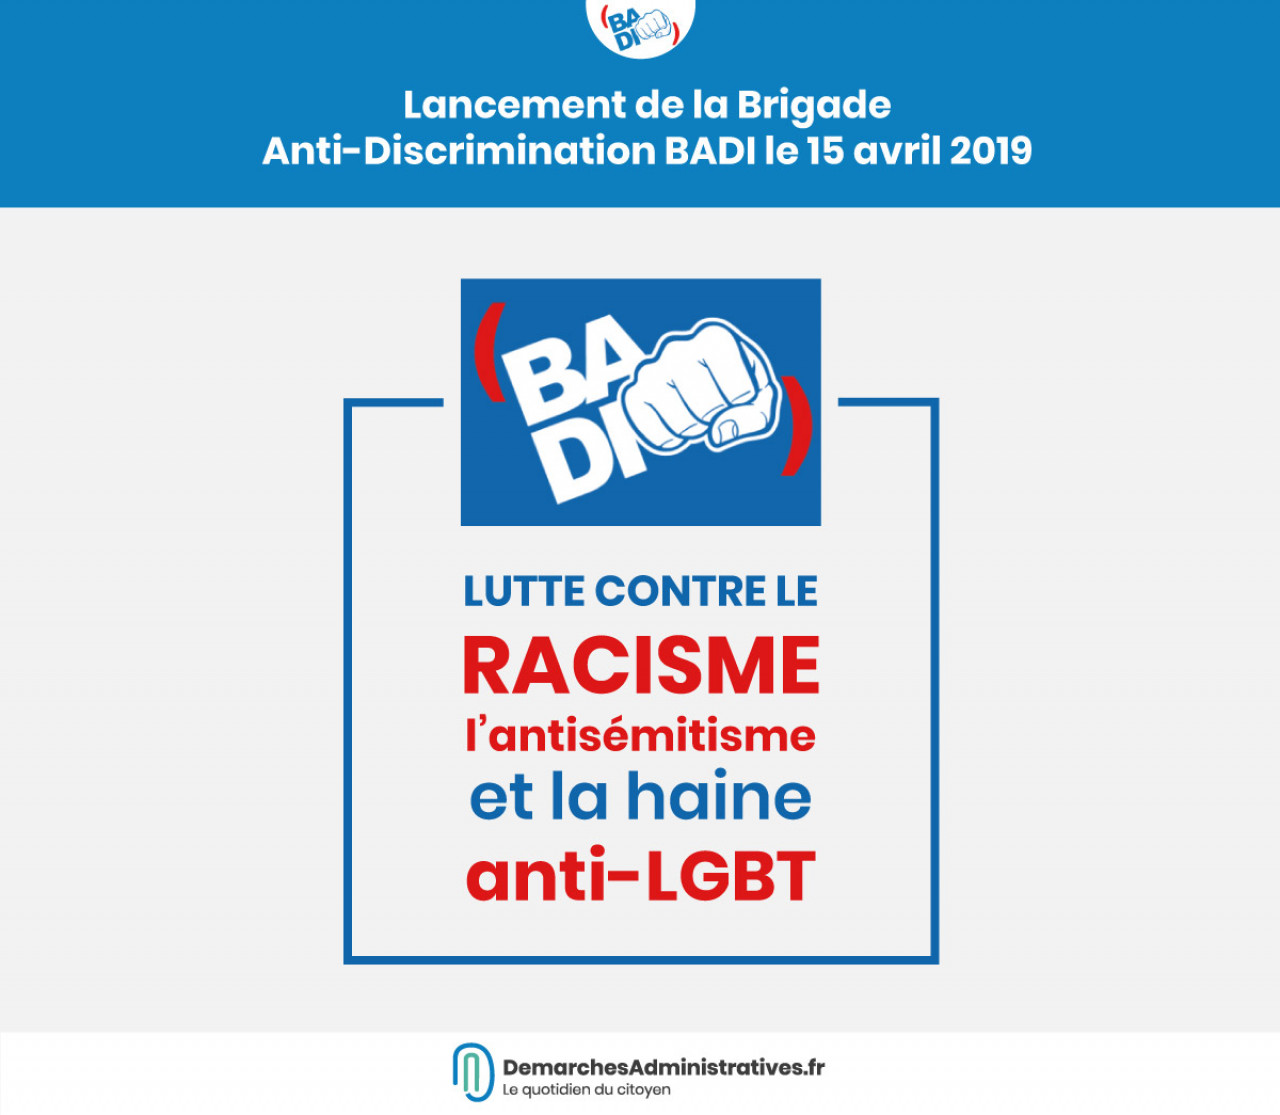 Lancement d'une brigade anti-discrimination sur Facebook